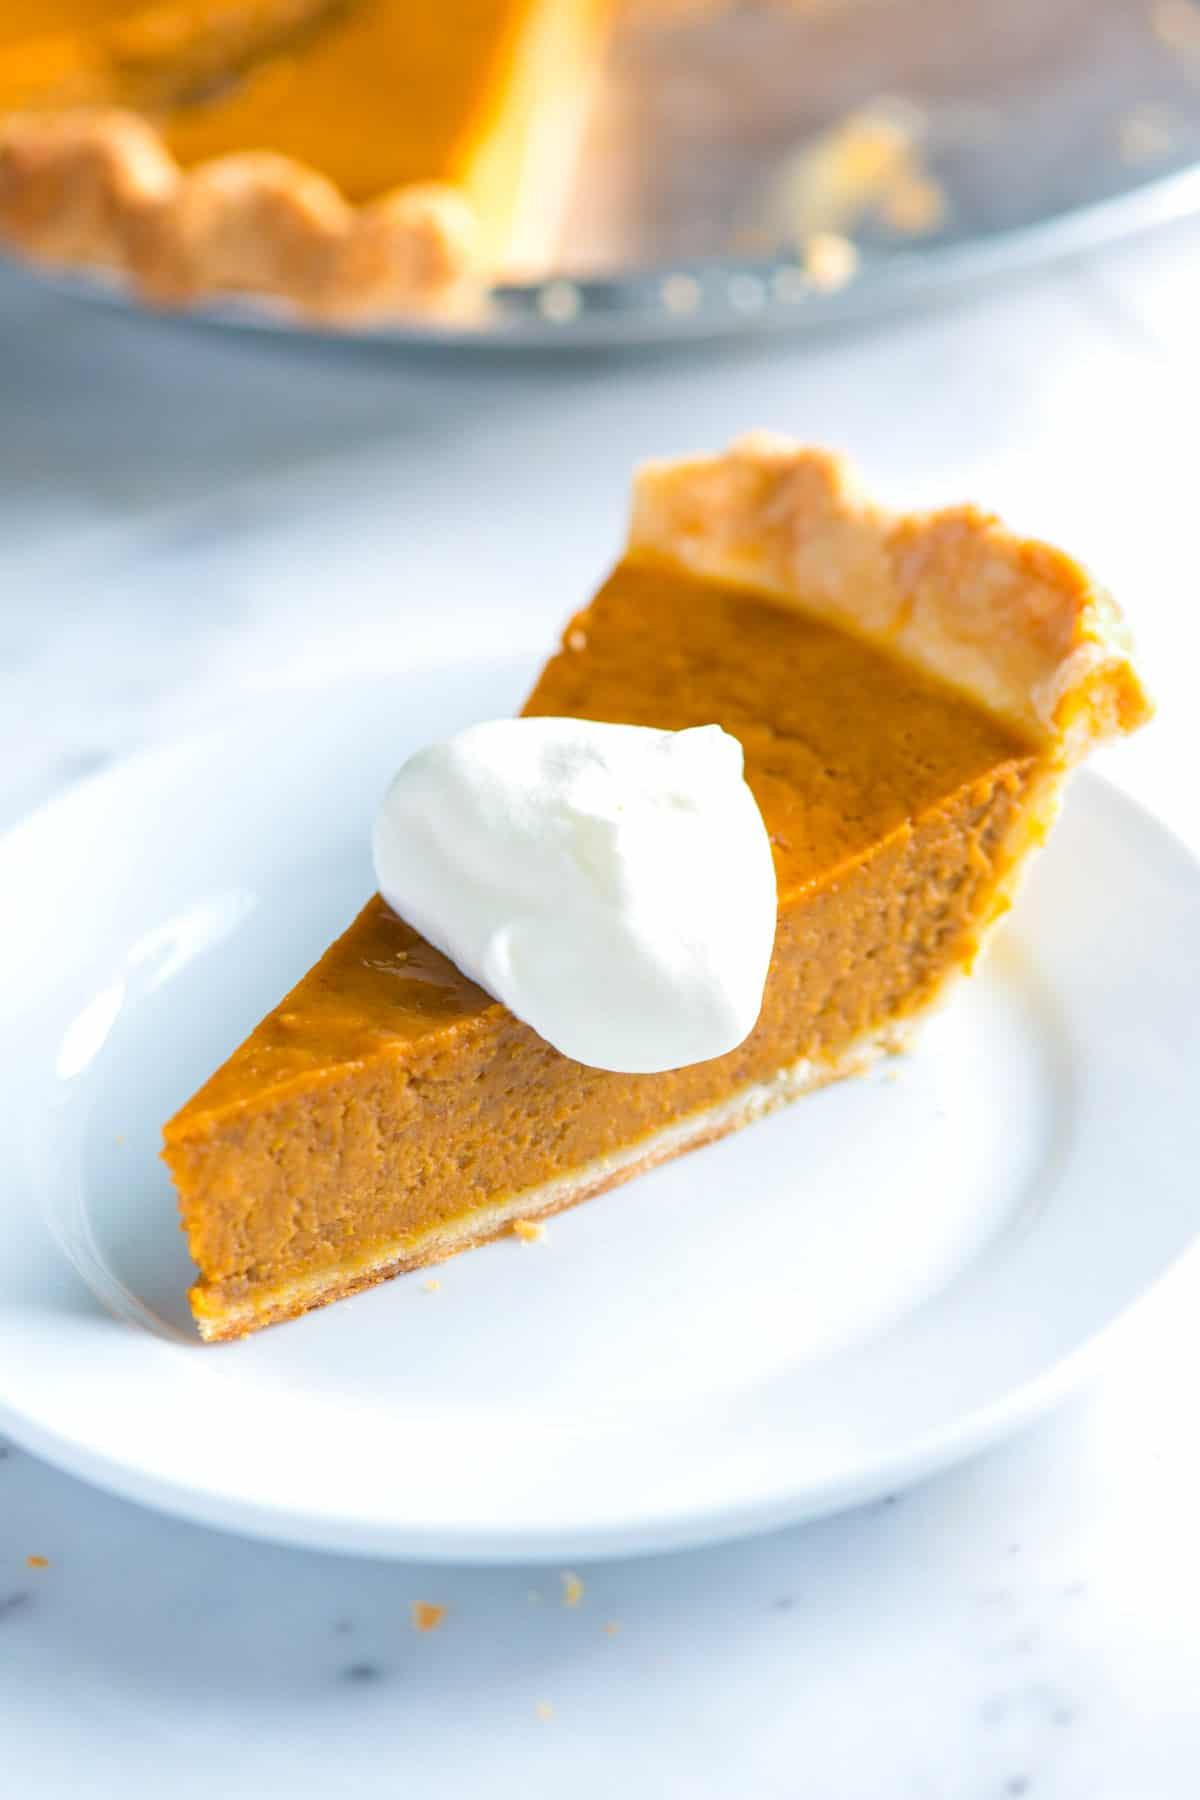 Pumpkin Pie Ingredients  No Fail Homemade Pumpkin Pie Recipe